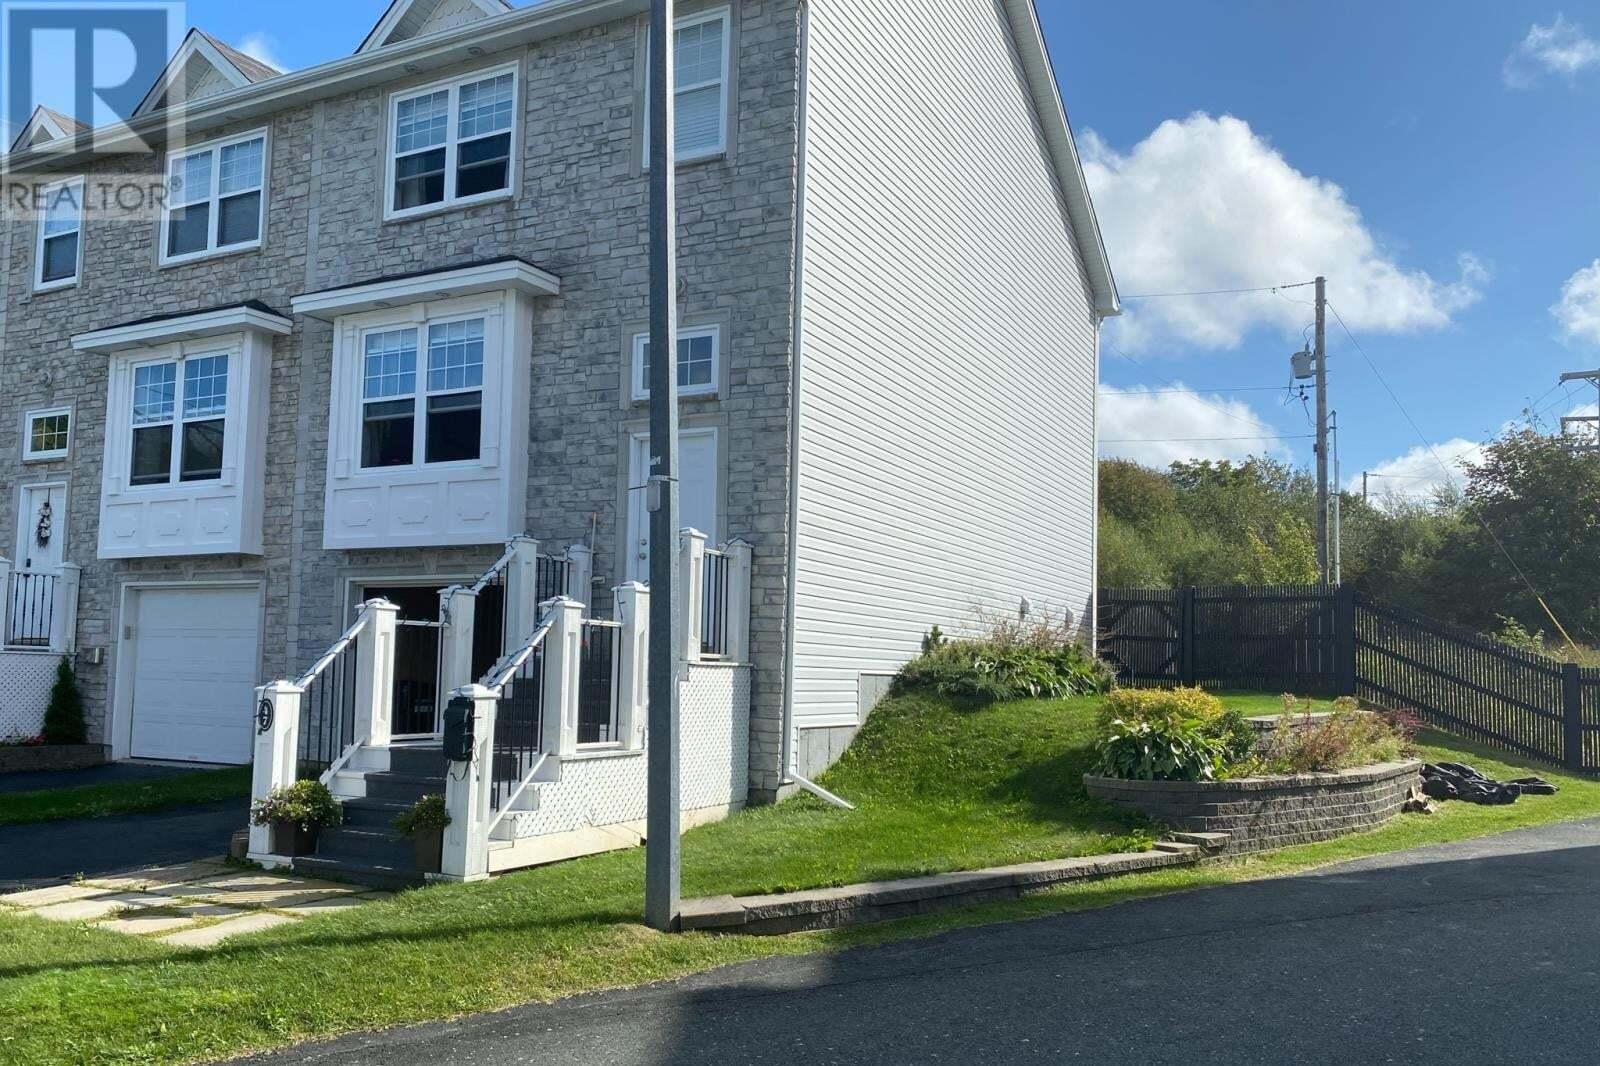 House for sale at 47 King Edward Pl St.john's Newfoundland - MLS: 1221919